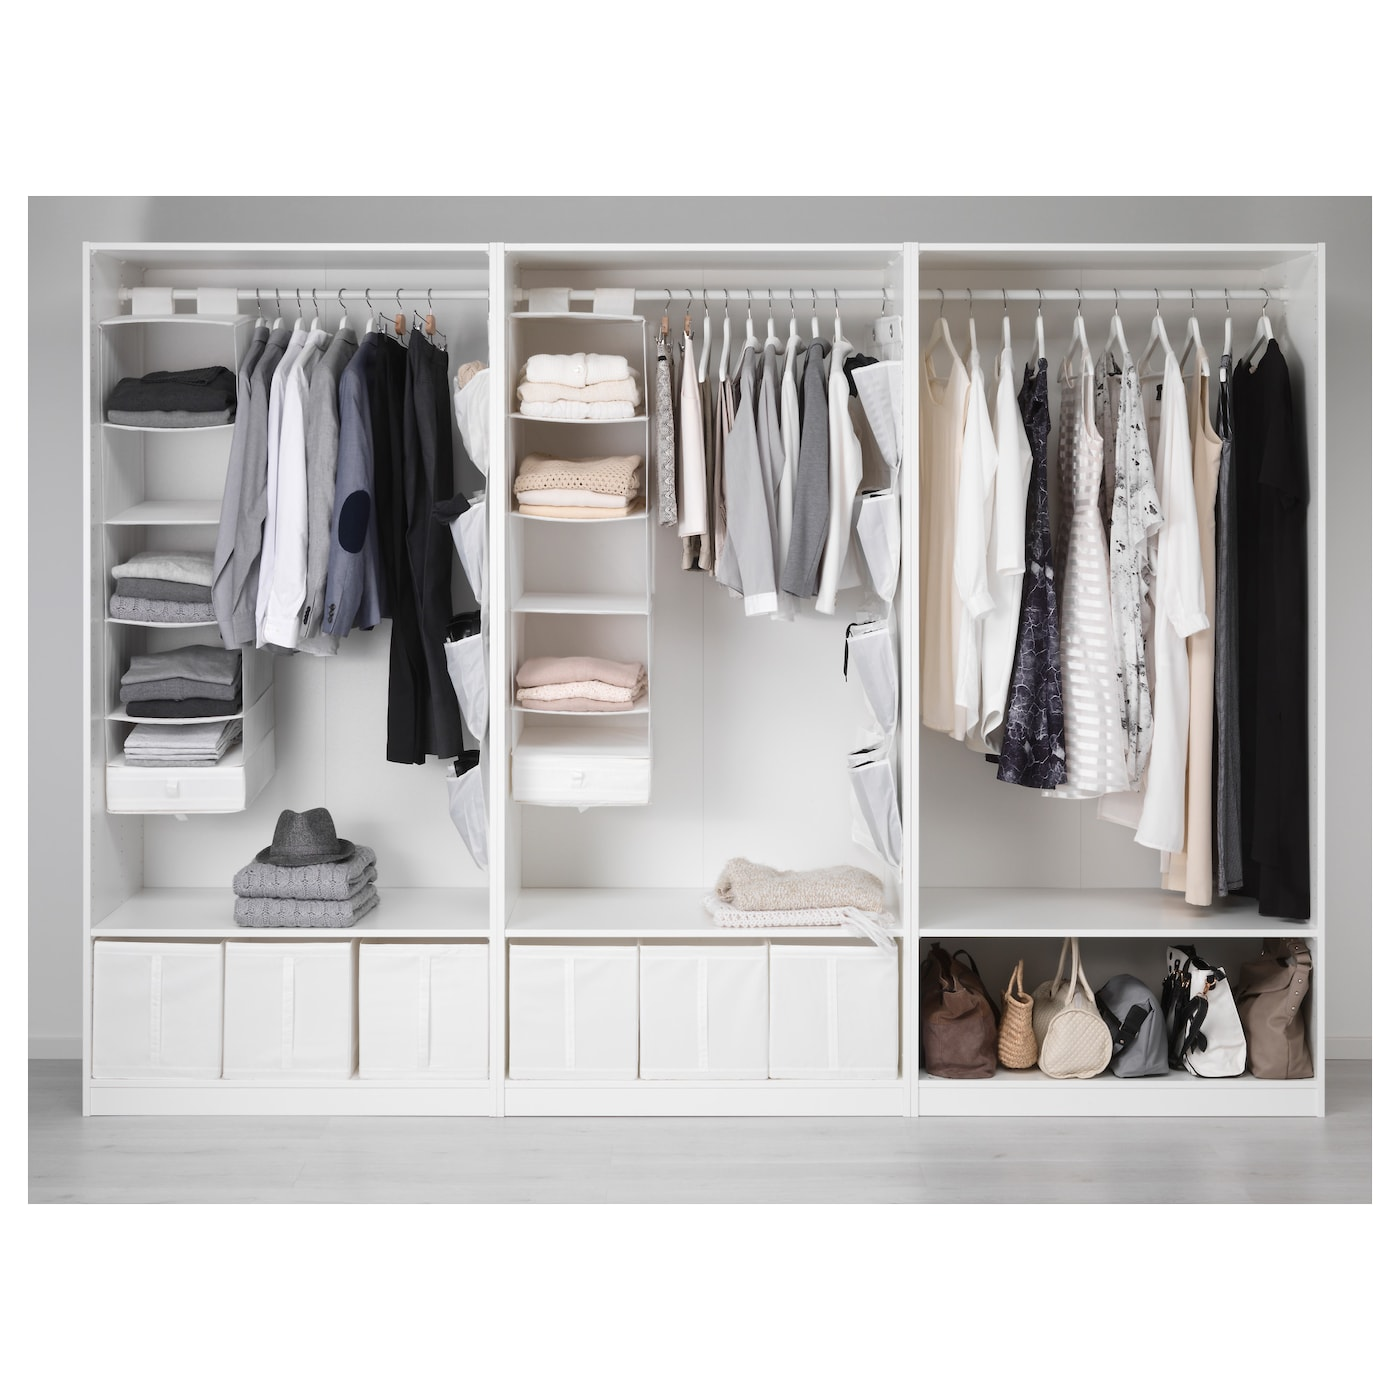 Pax wardrobe white bergsbo vikedal 300x60x201 cm ikea for Ikea wardrobe